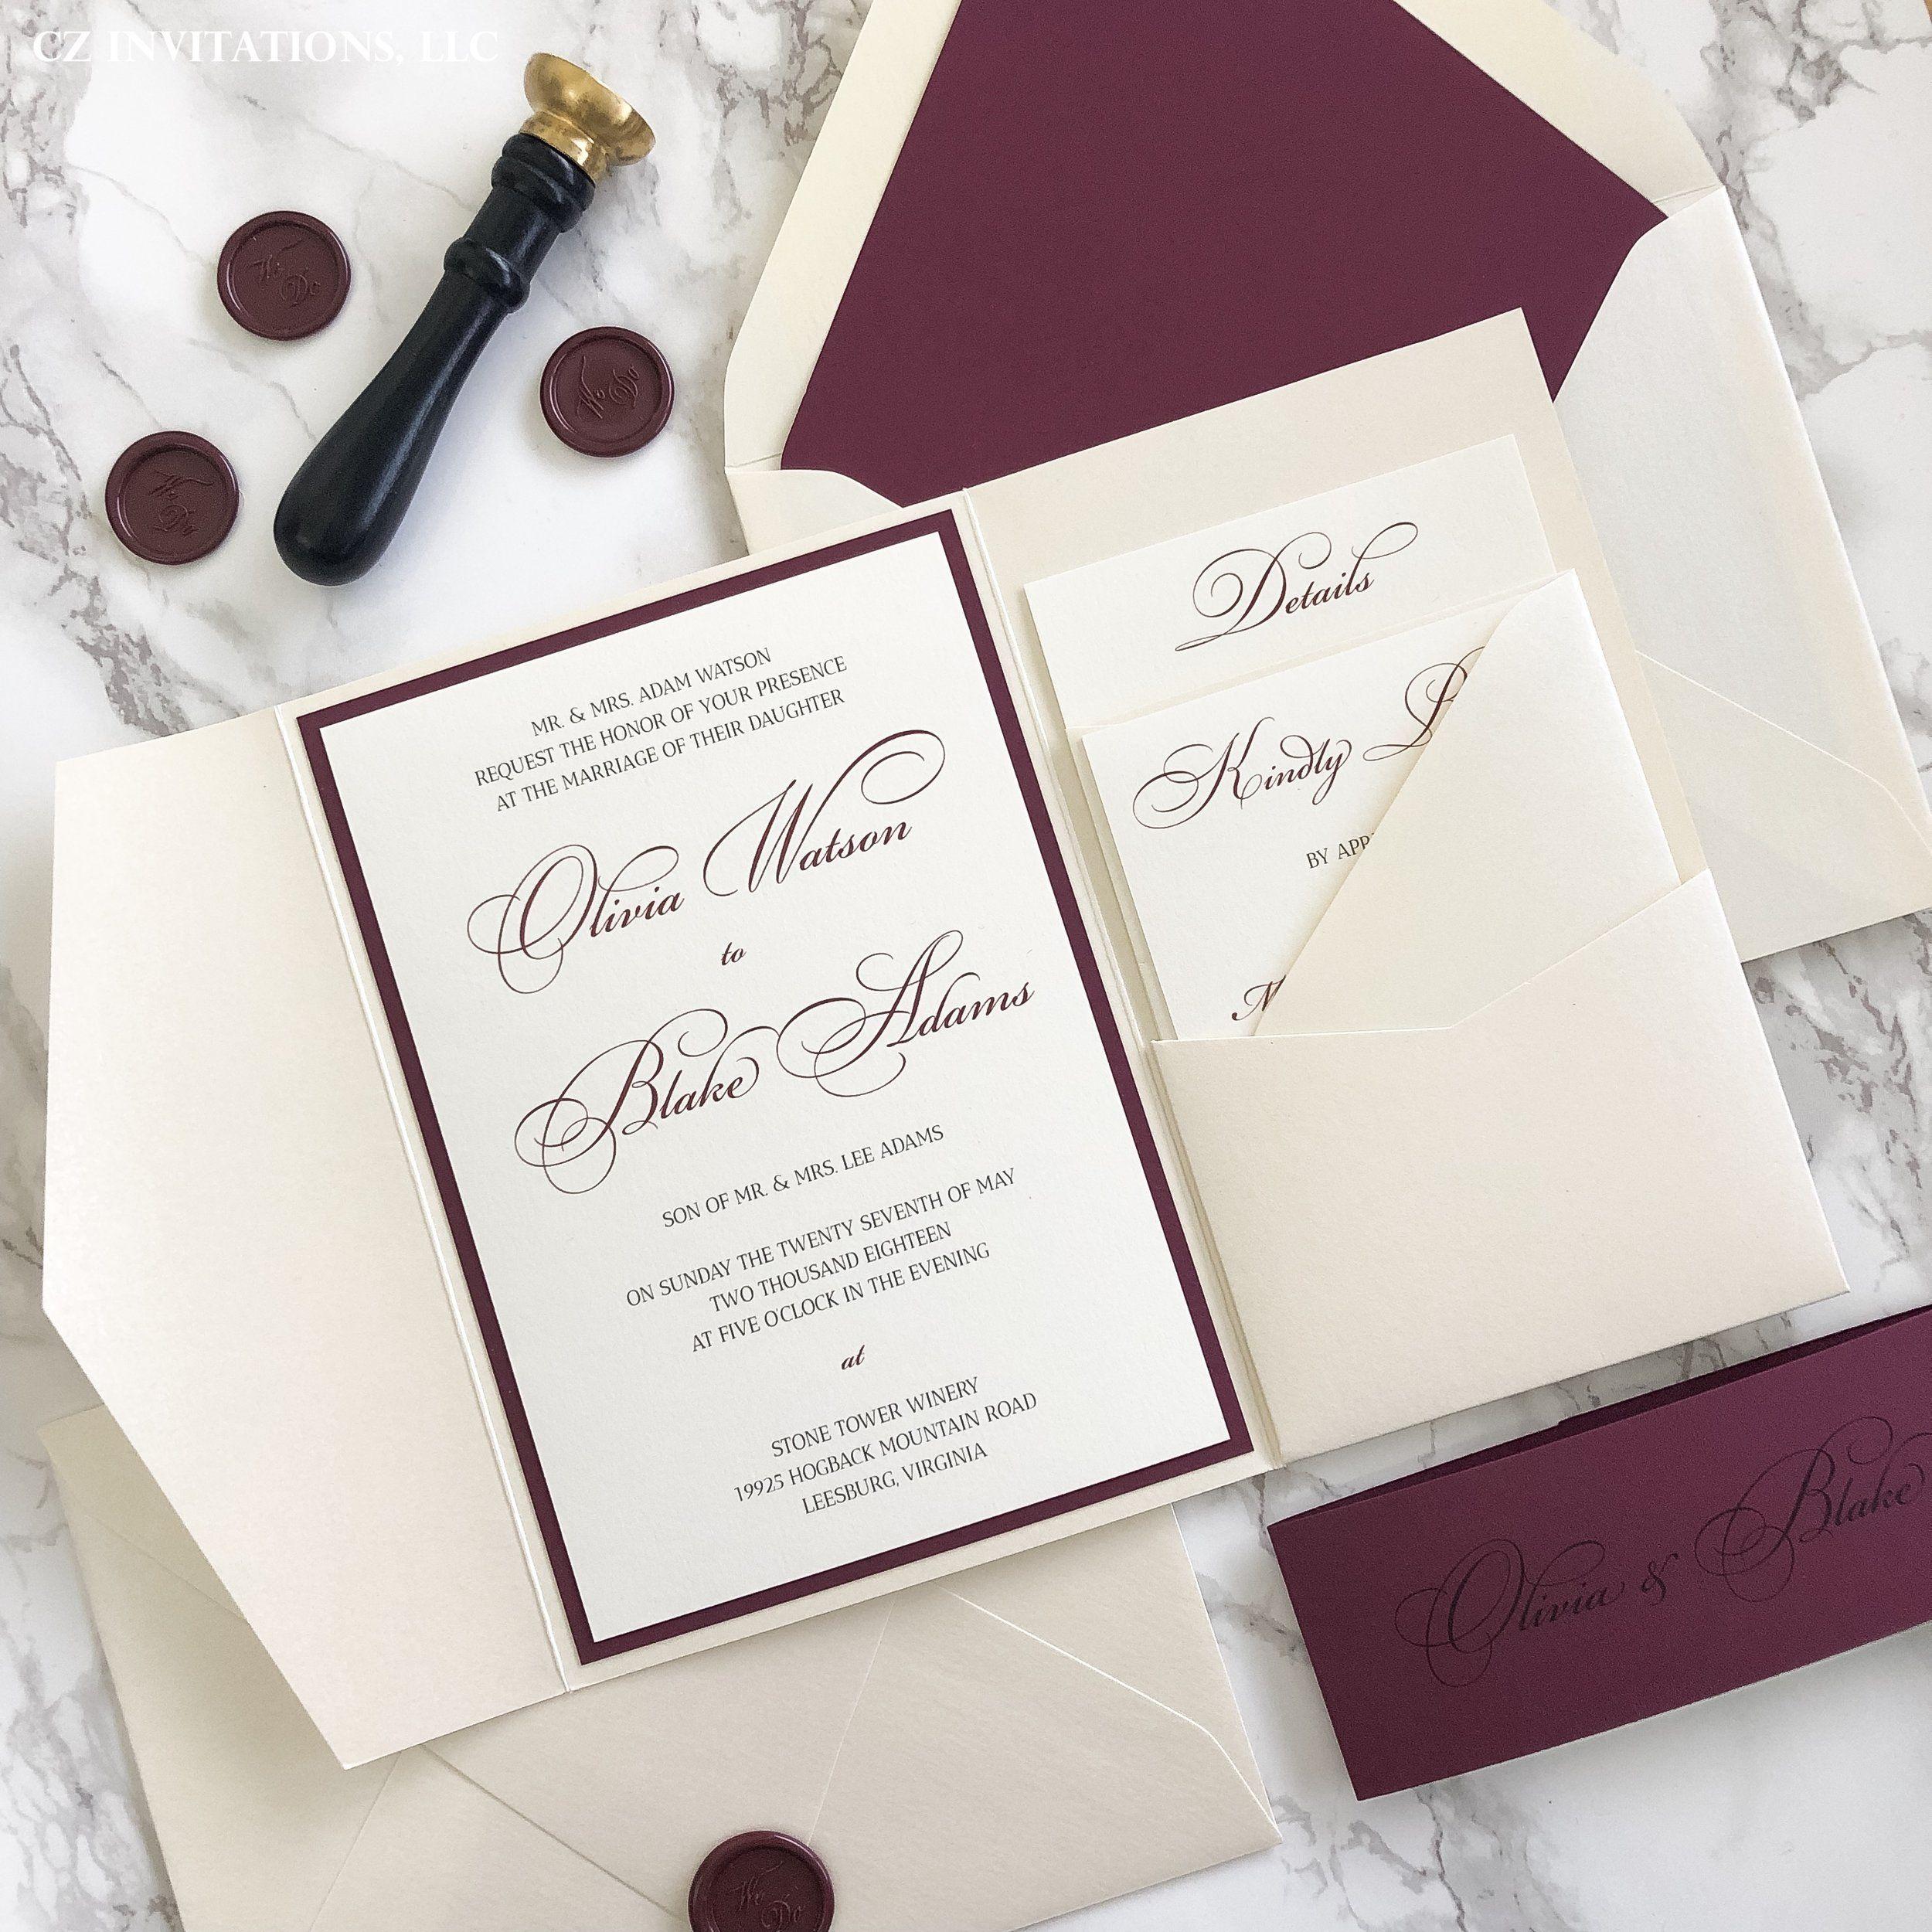 Burgundy And Opal Pocket Wedding Invitation Cz Invitations Pocket Wedding Invitations Wedding Invitations Diy Wedding Invitations